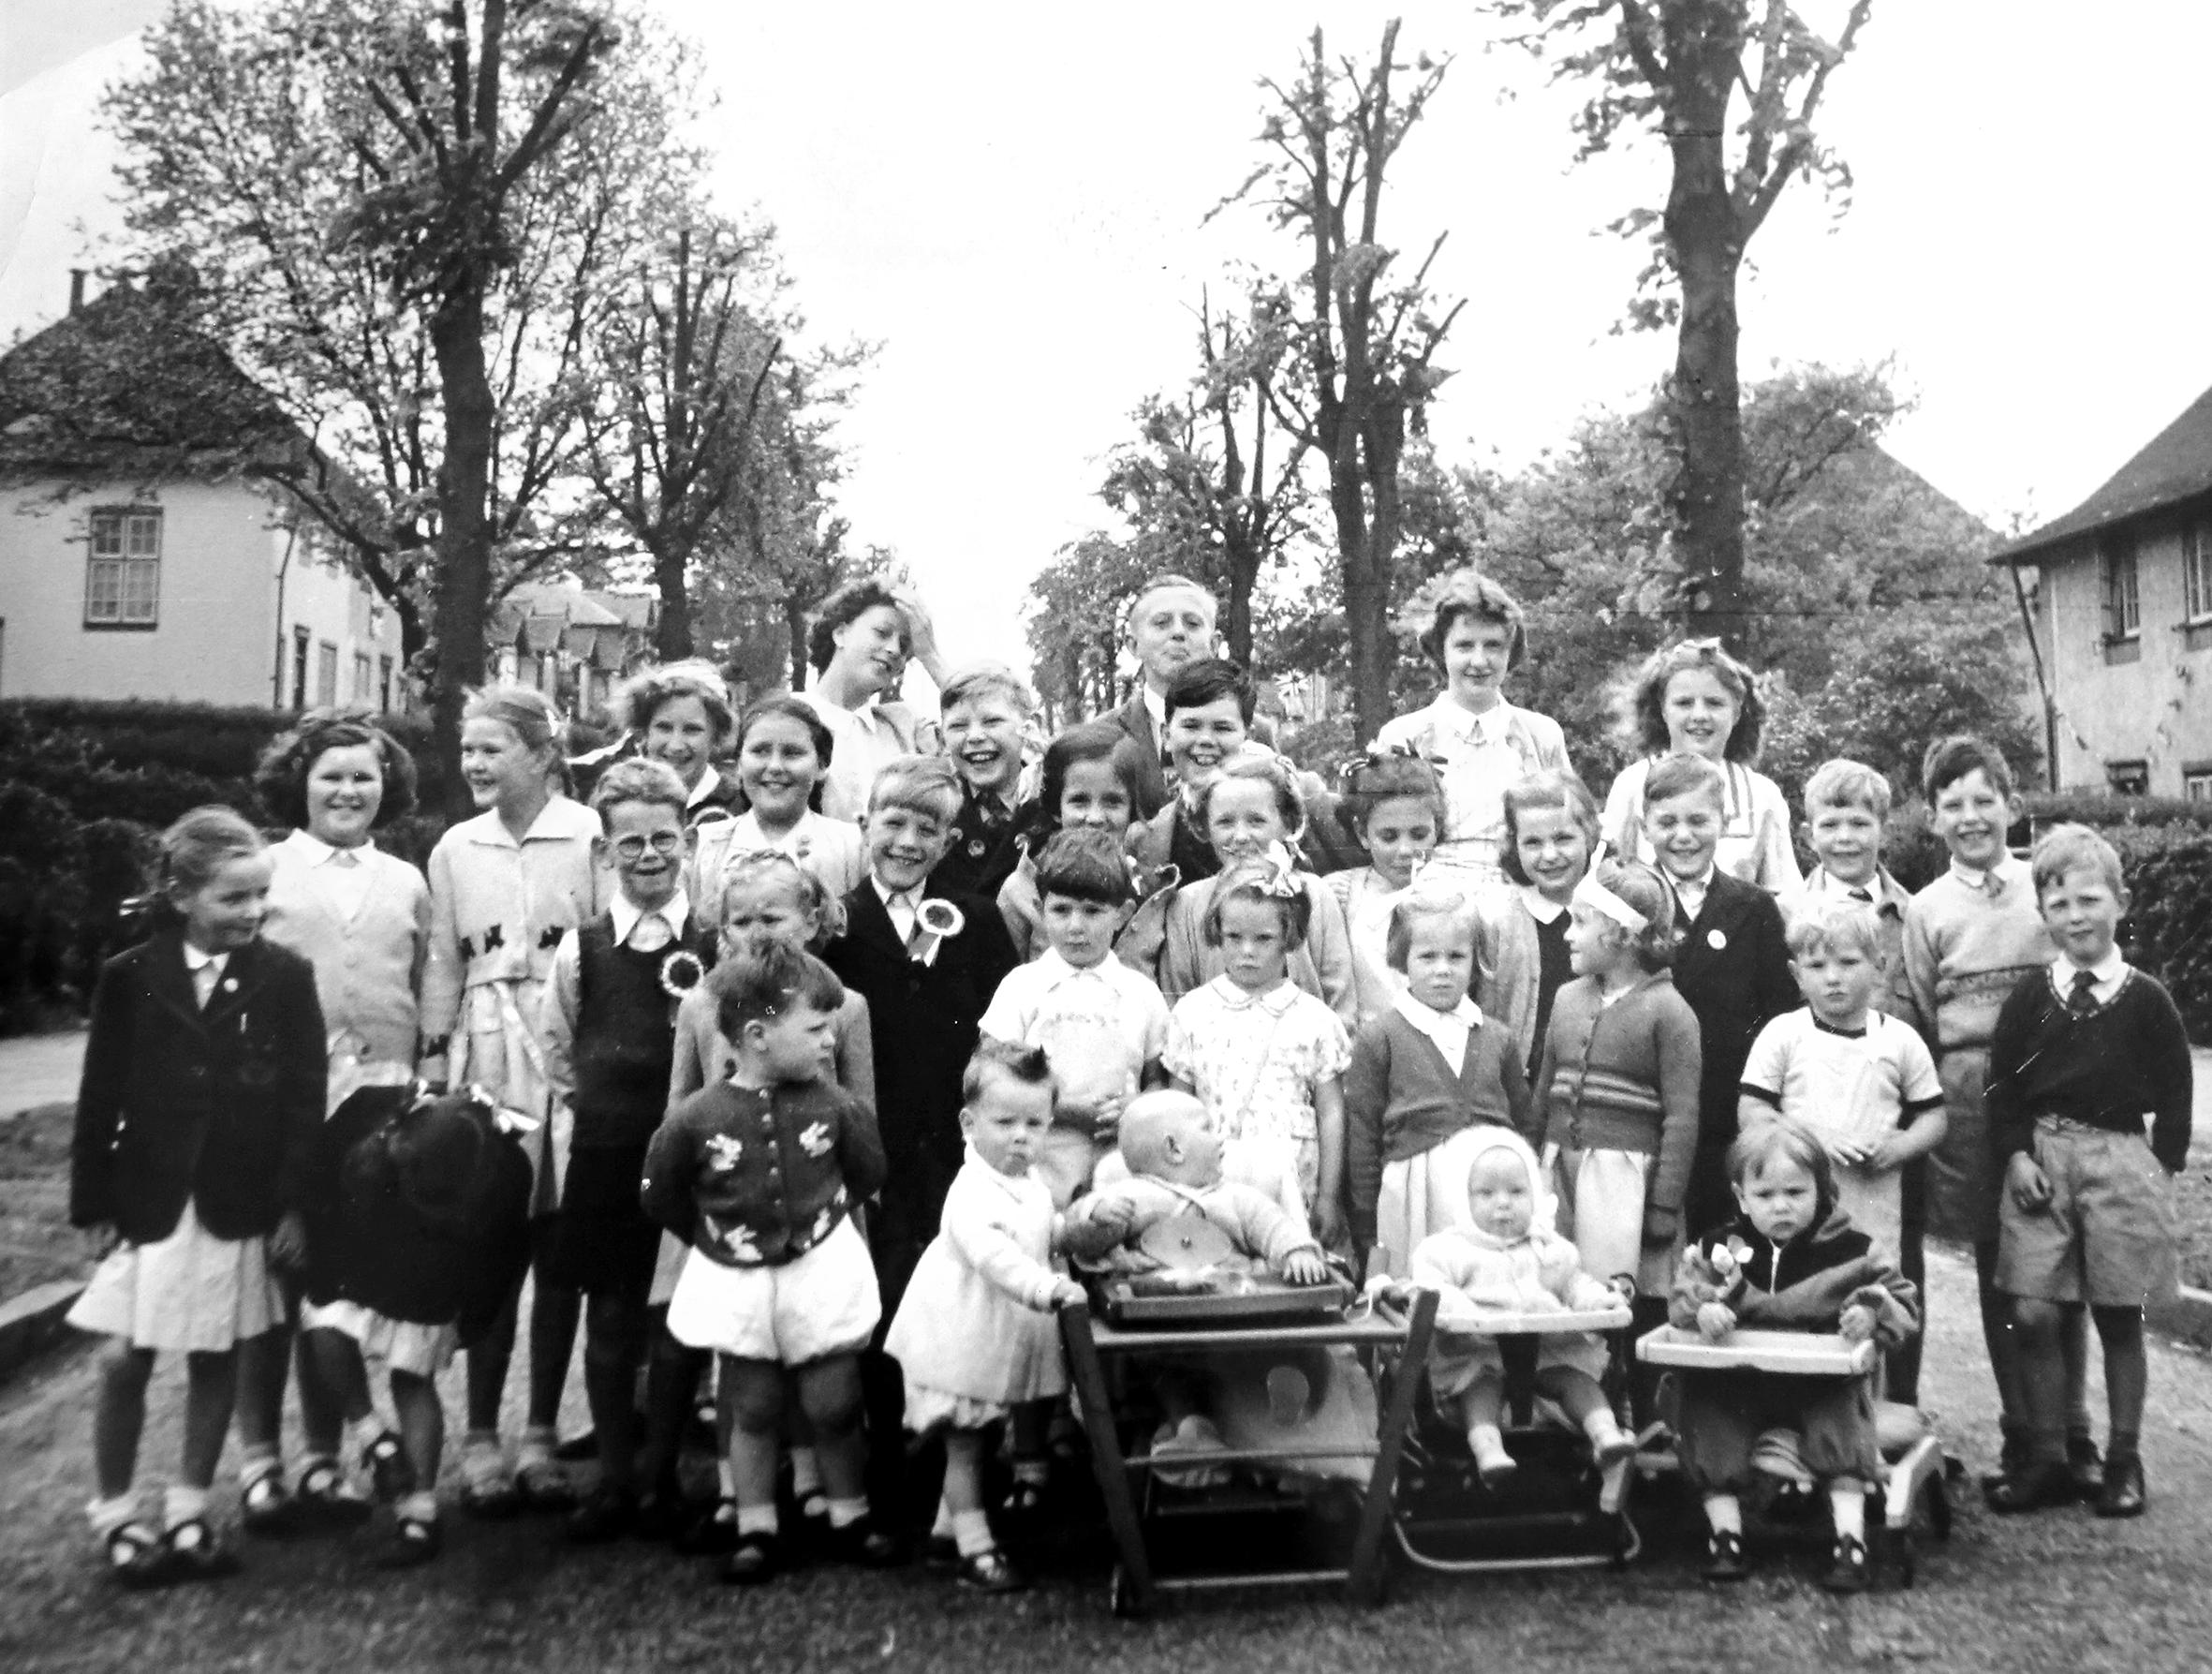 Austin Village Children at the Queen's Coronation street party, 2 June 1953.